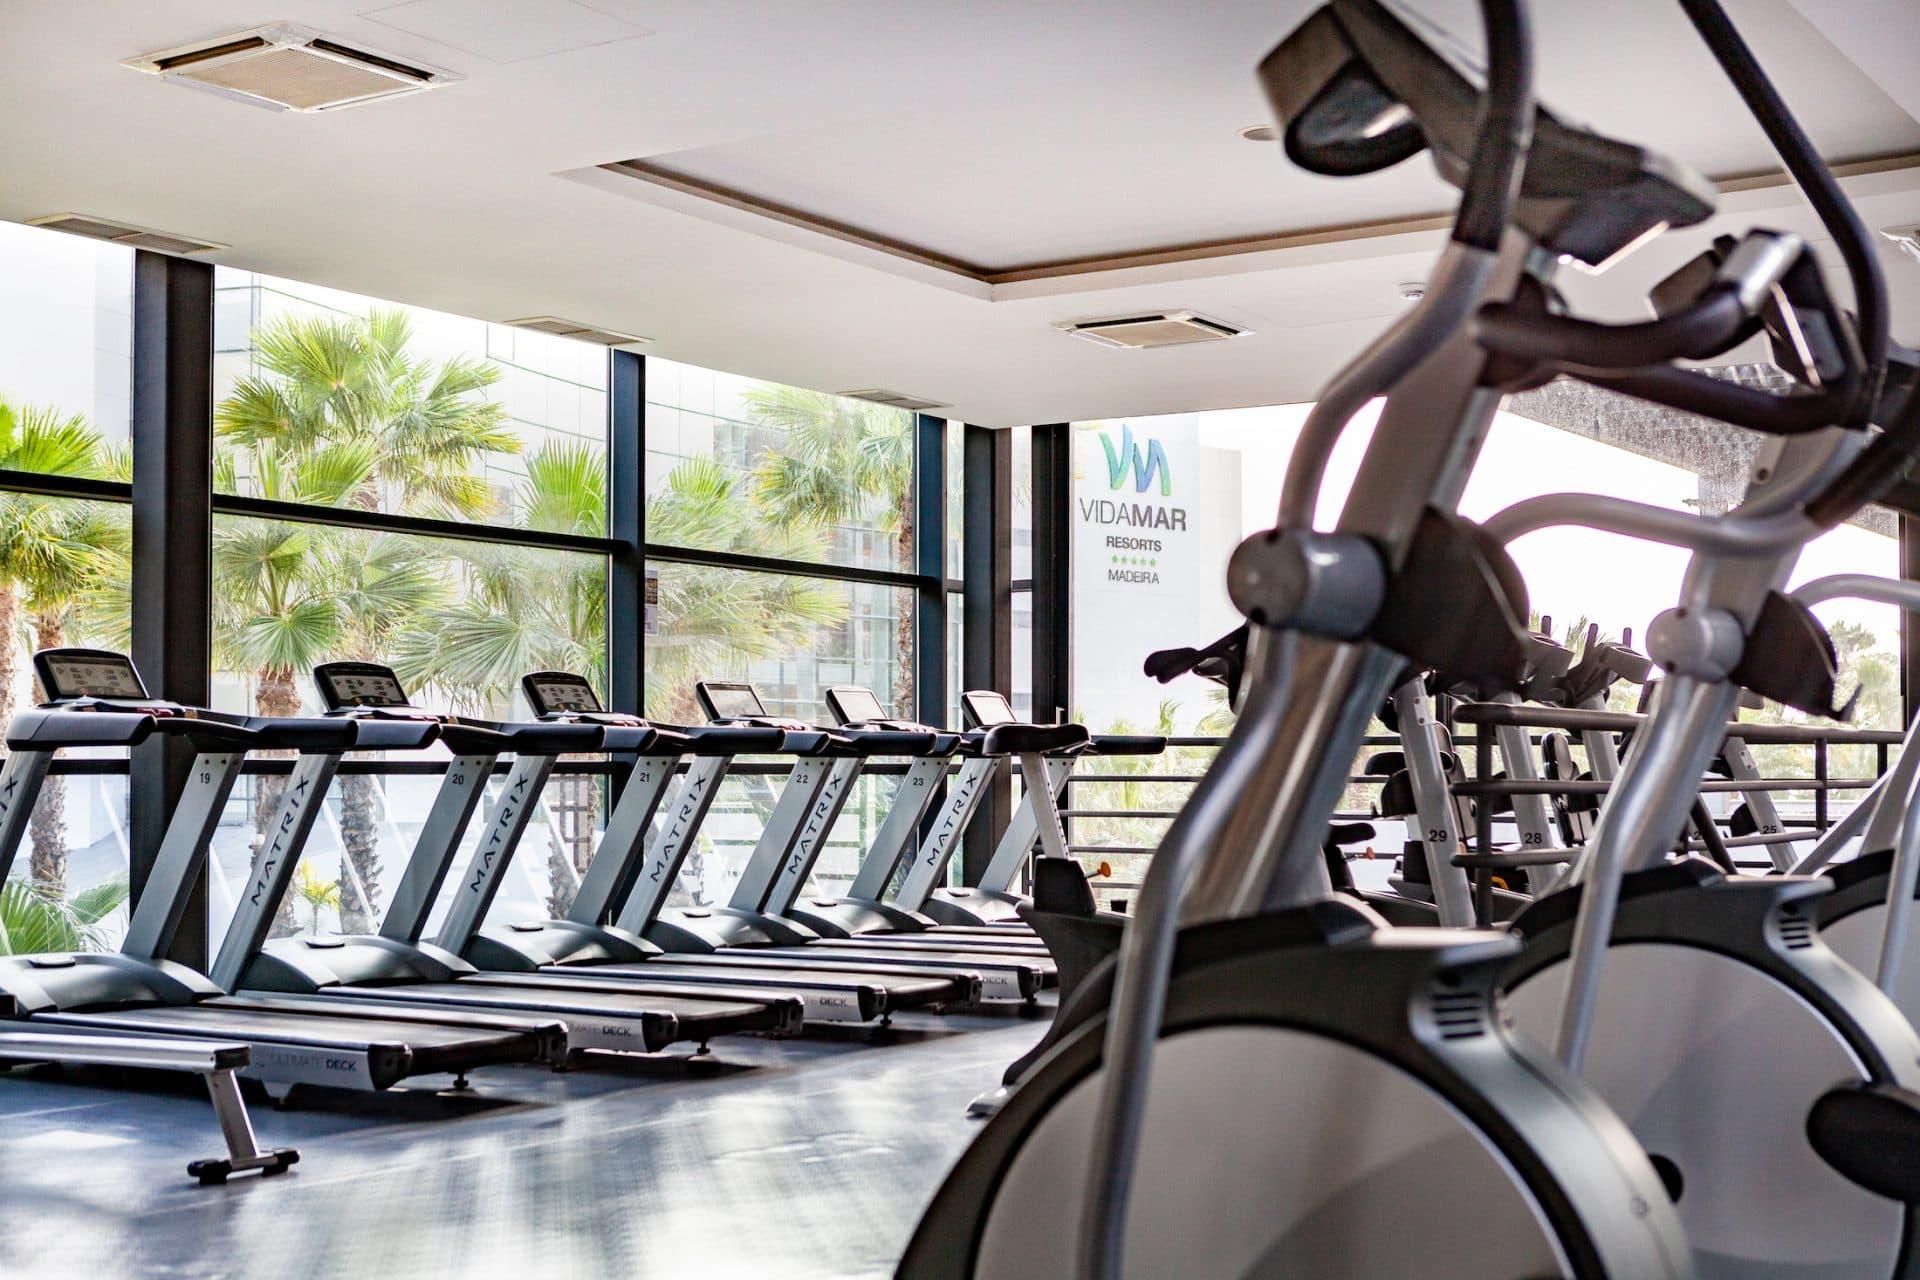 vida-health-club-overview-VidaMar-hotels-resorts-madeira